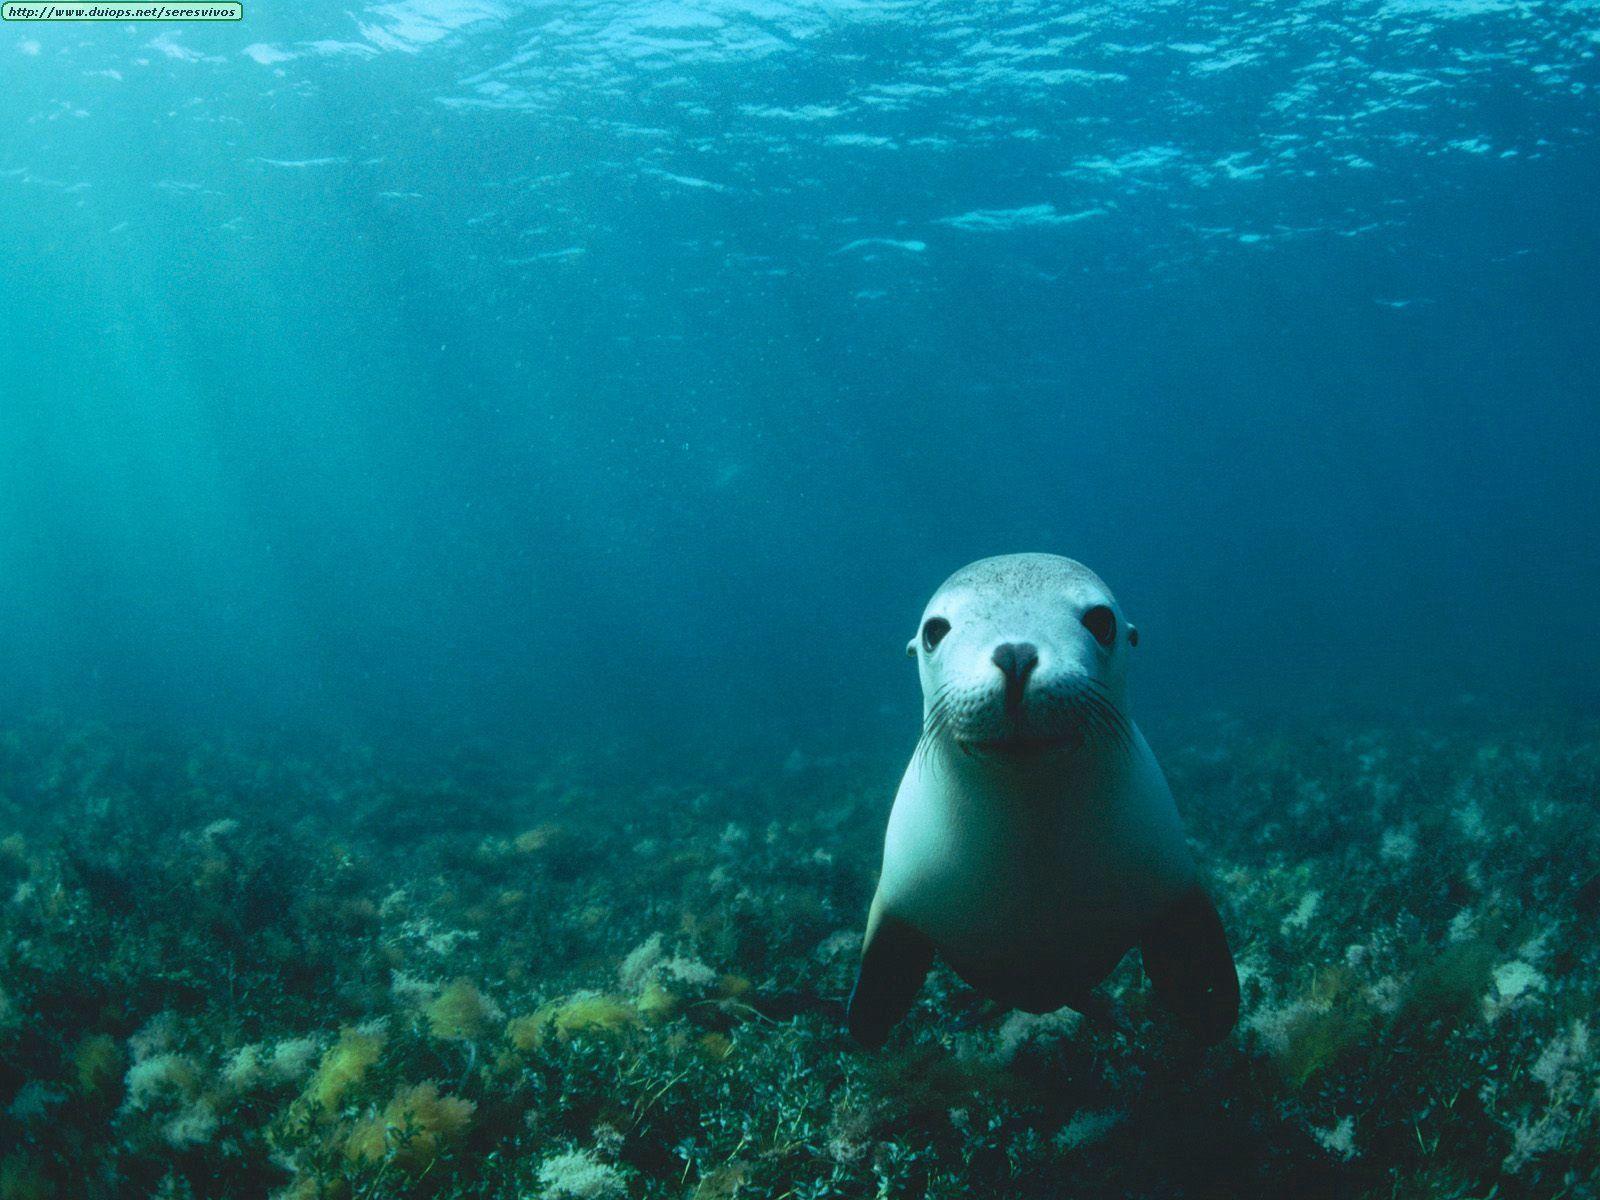 sea lion under water free desktop background free wallpaper image